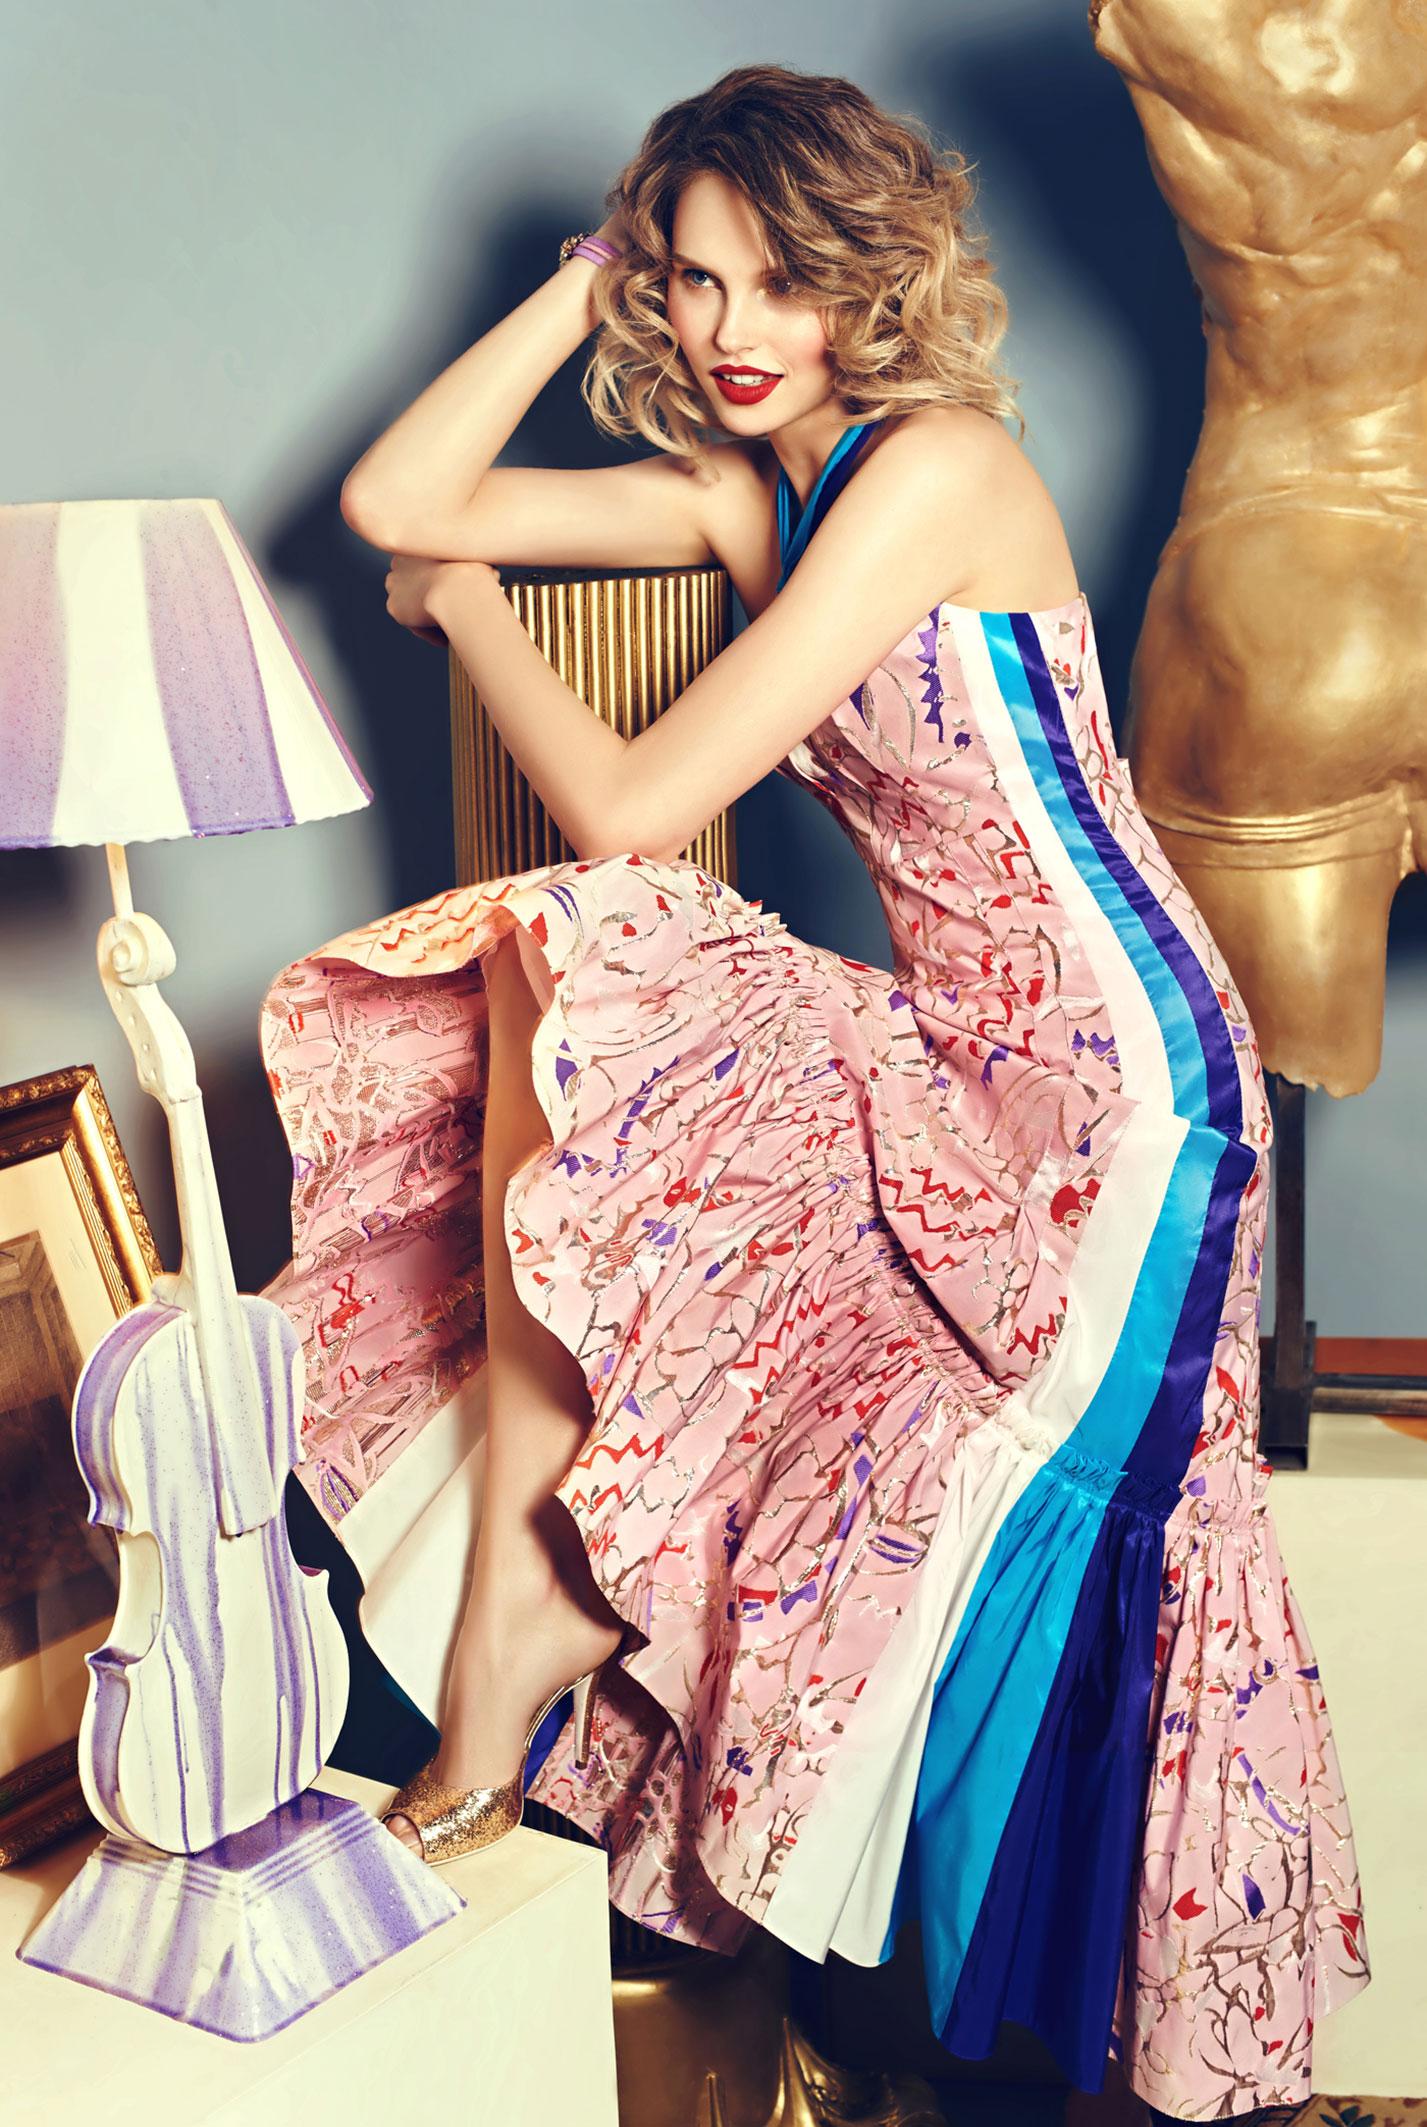 Антонина Ермолина в рекламной кампании модного бренда Au Pont Rouge, весна-лето 2017 / фото 02